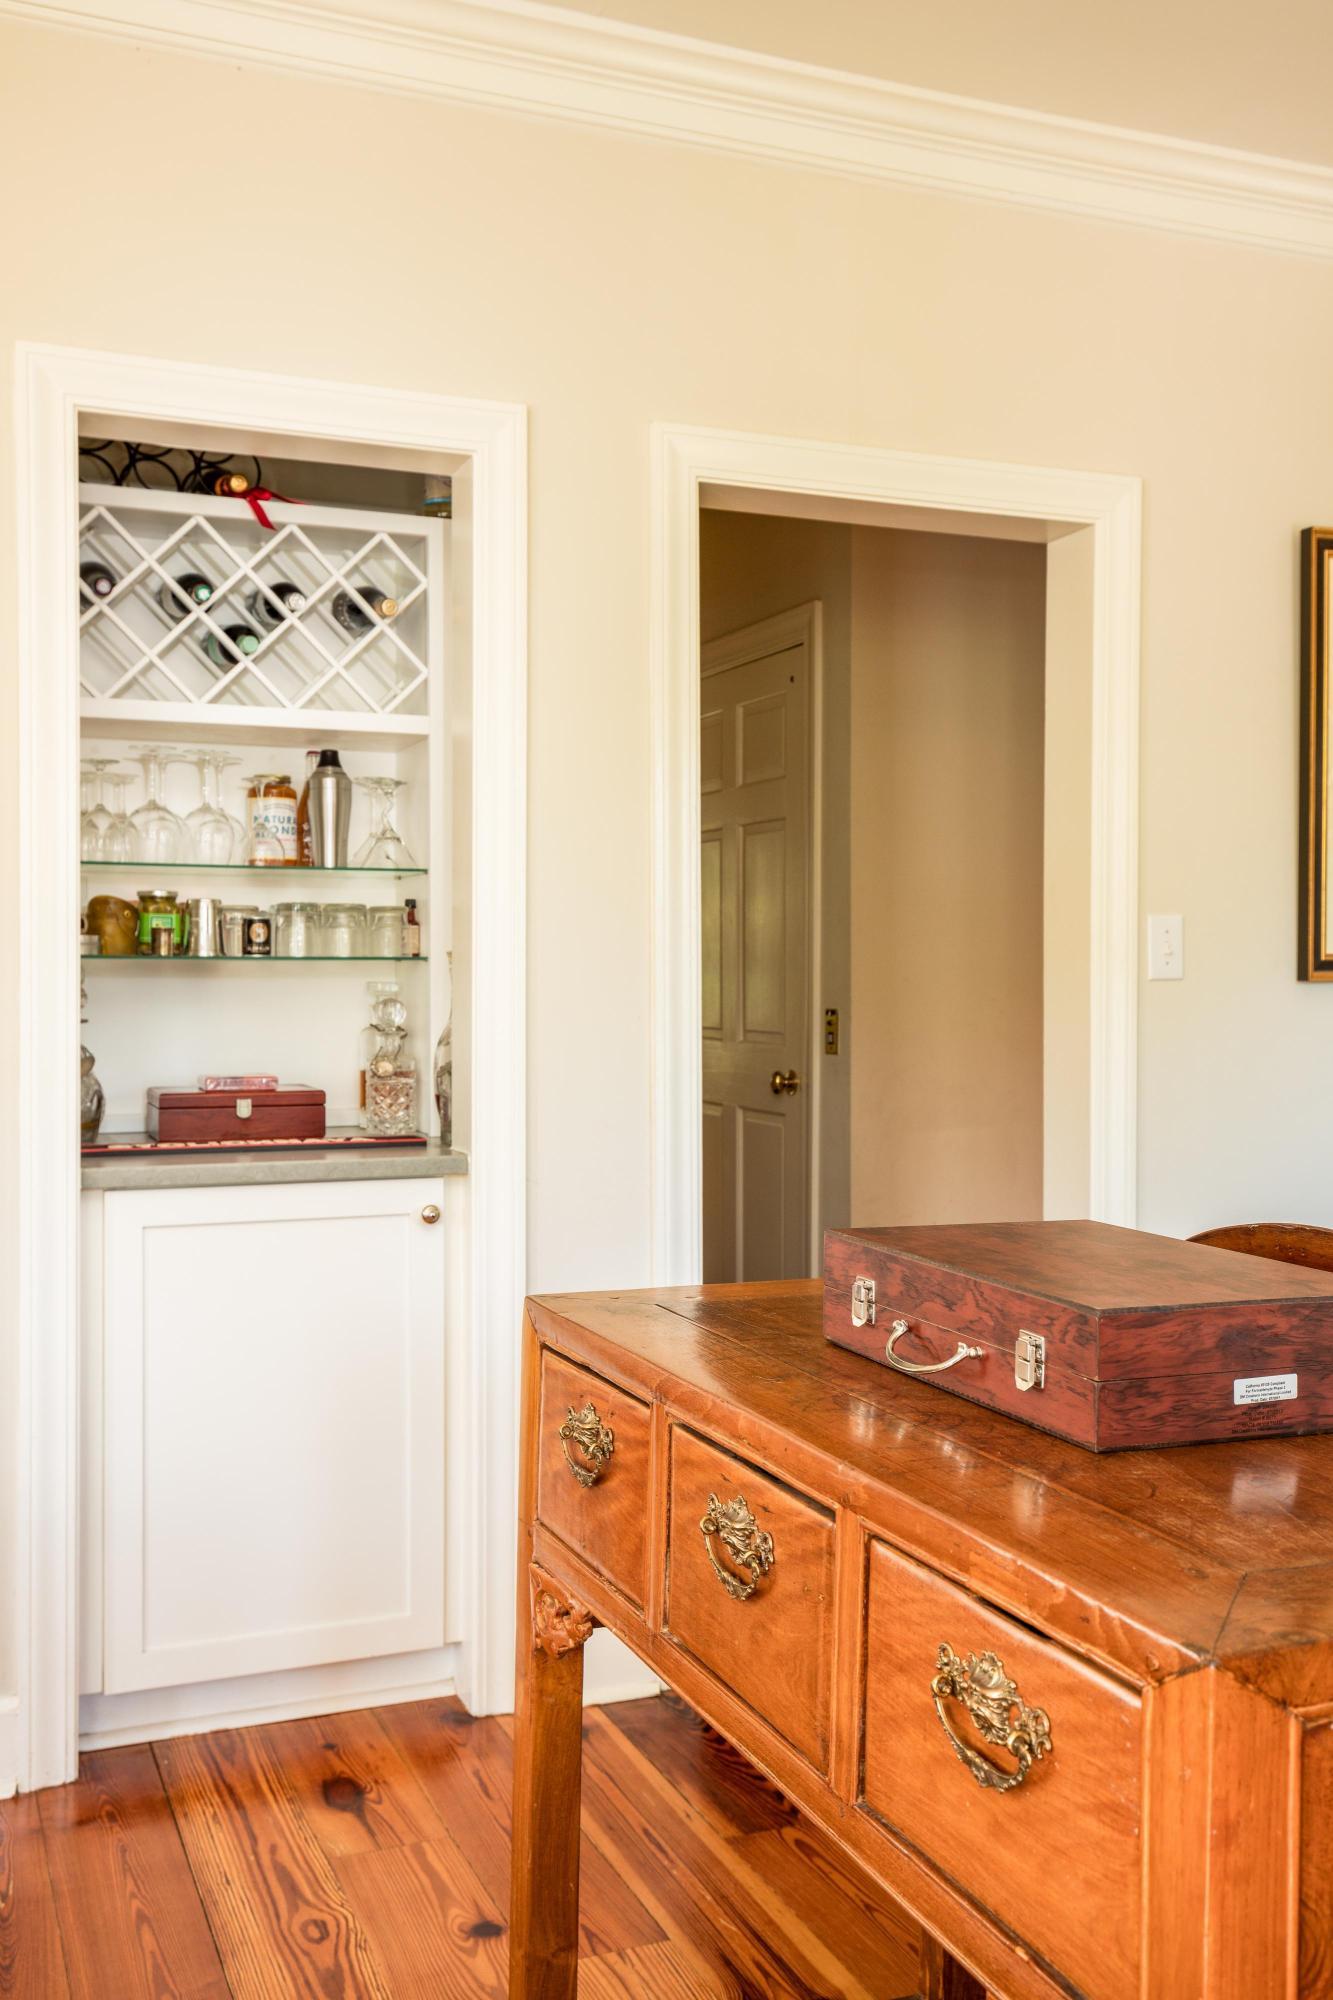 Harleston Village Homes For Sale - 39 Harleston, Charleston, SC - 9